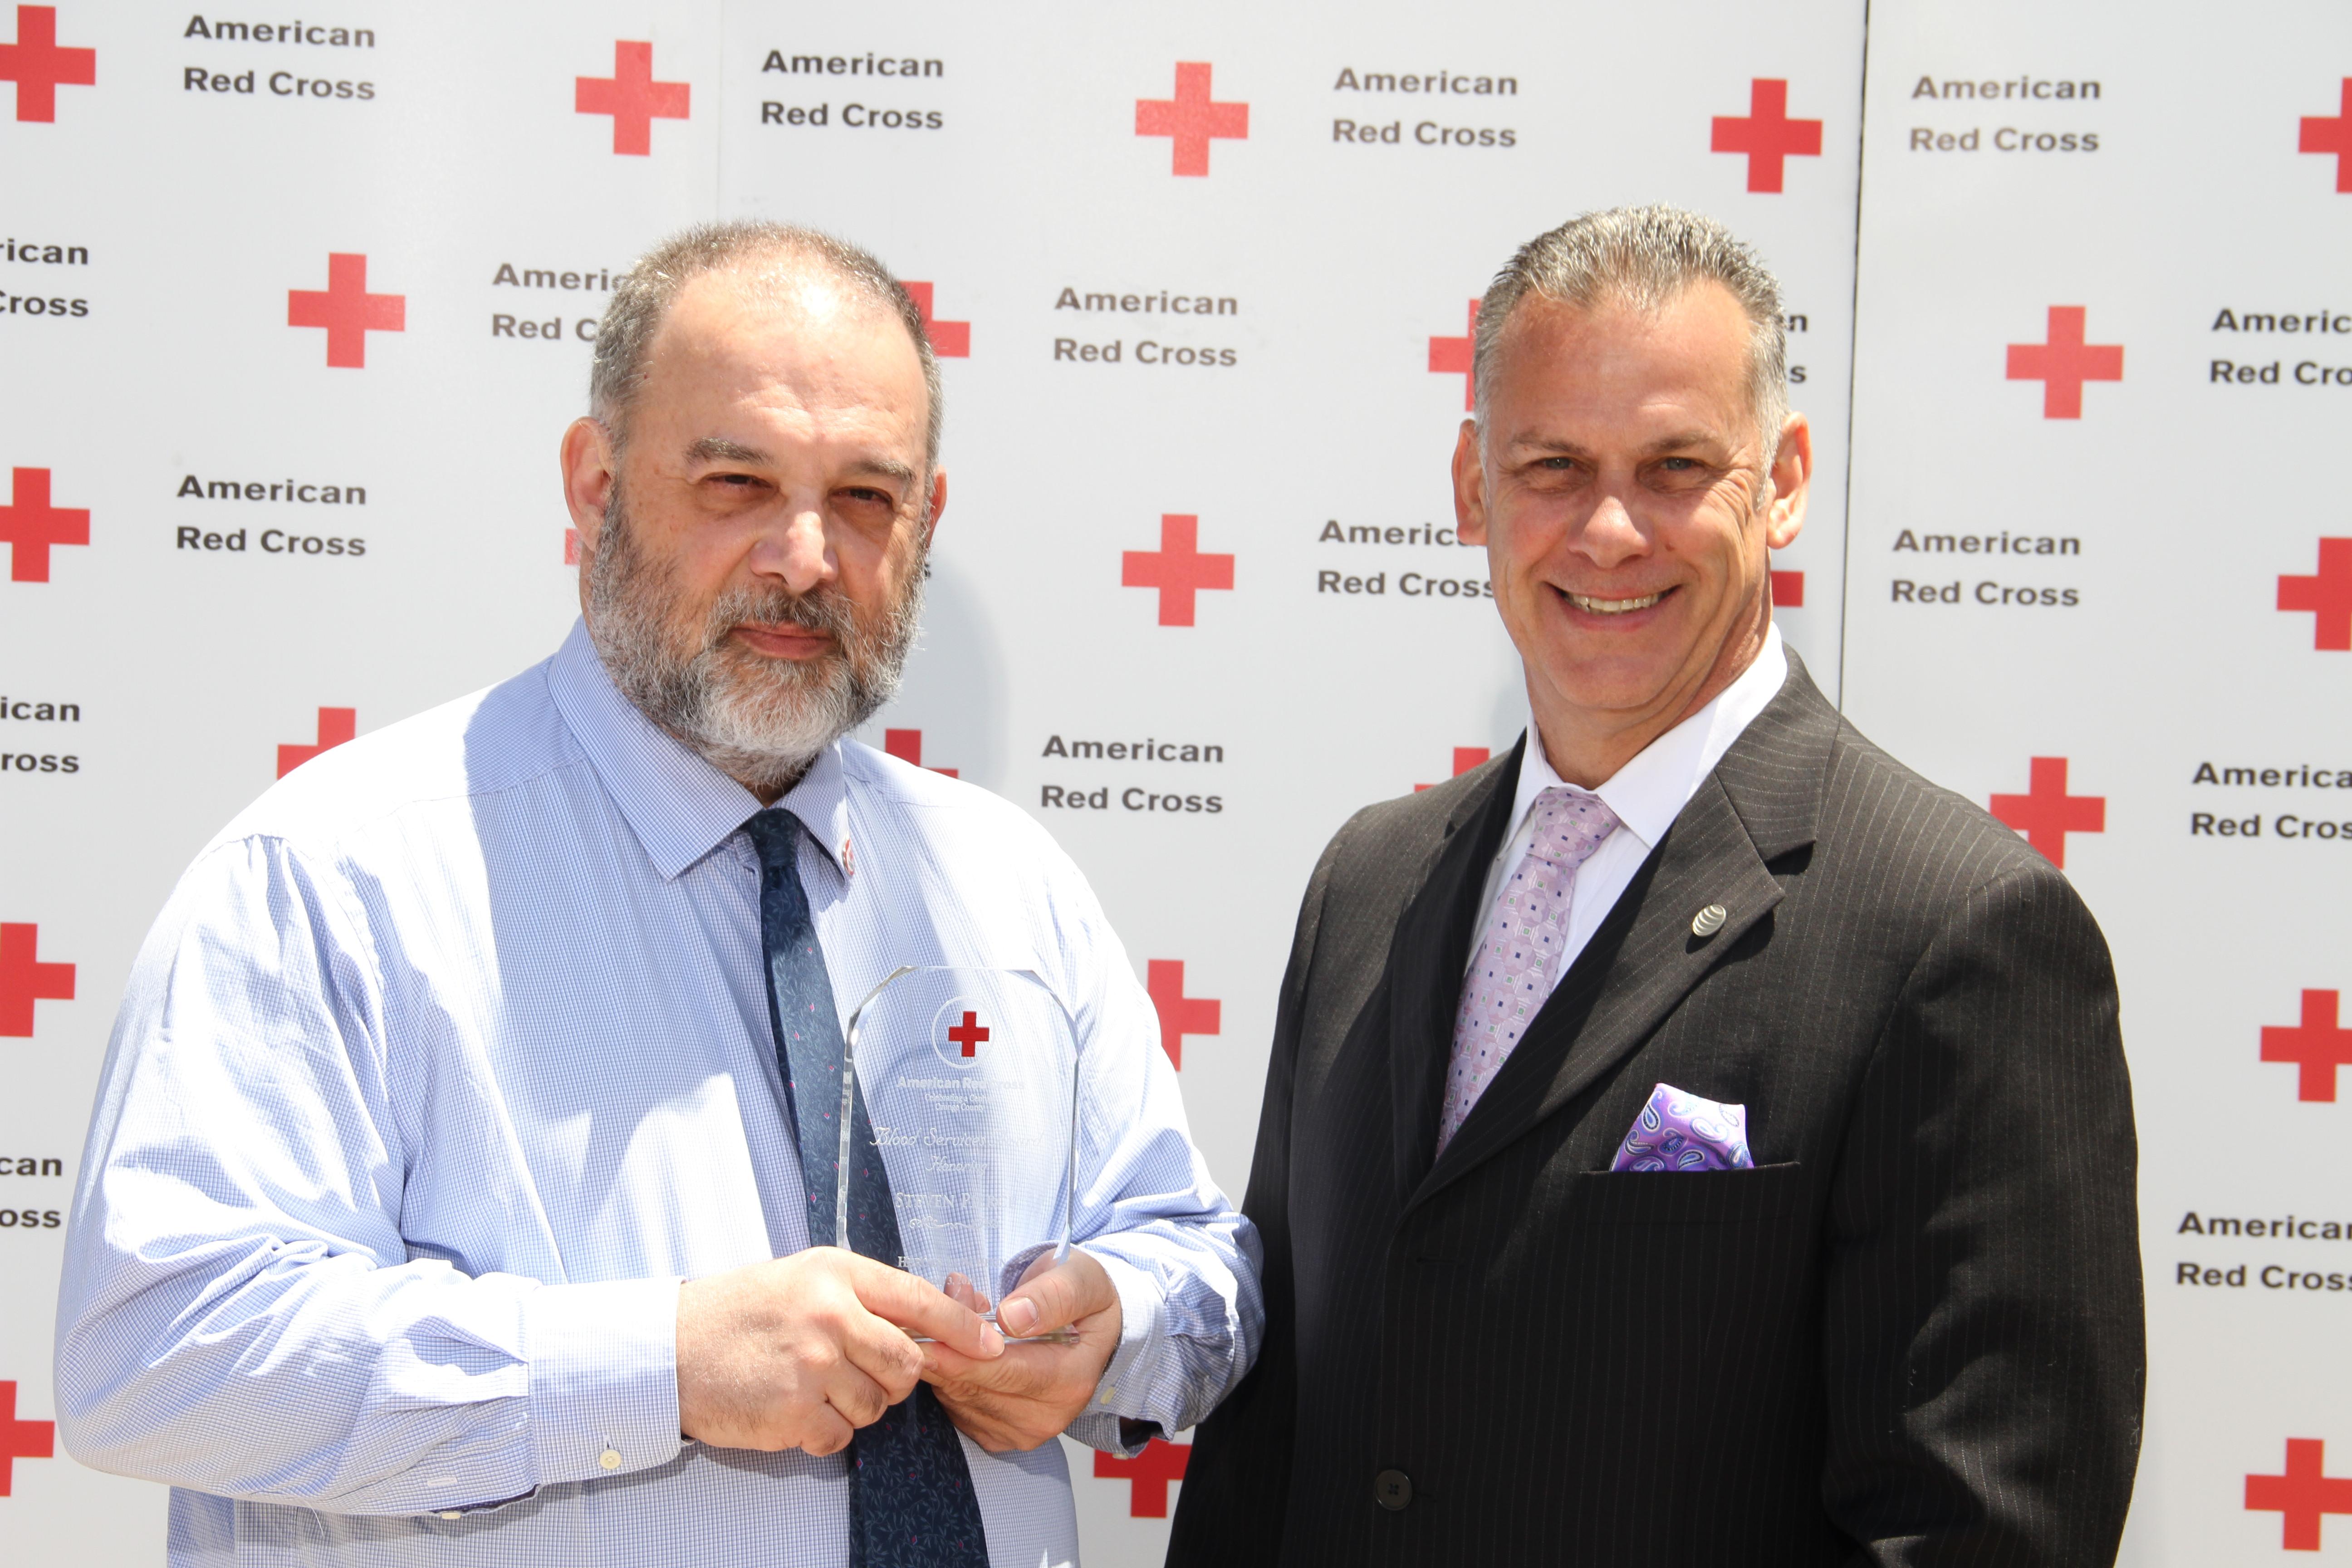 Blood Services Award winner Steven Pierce